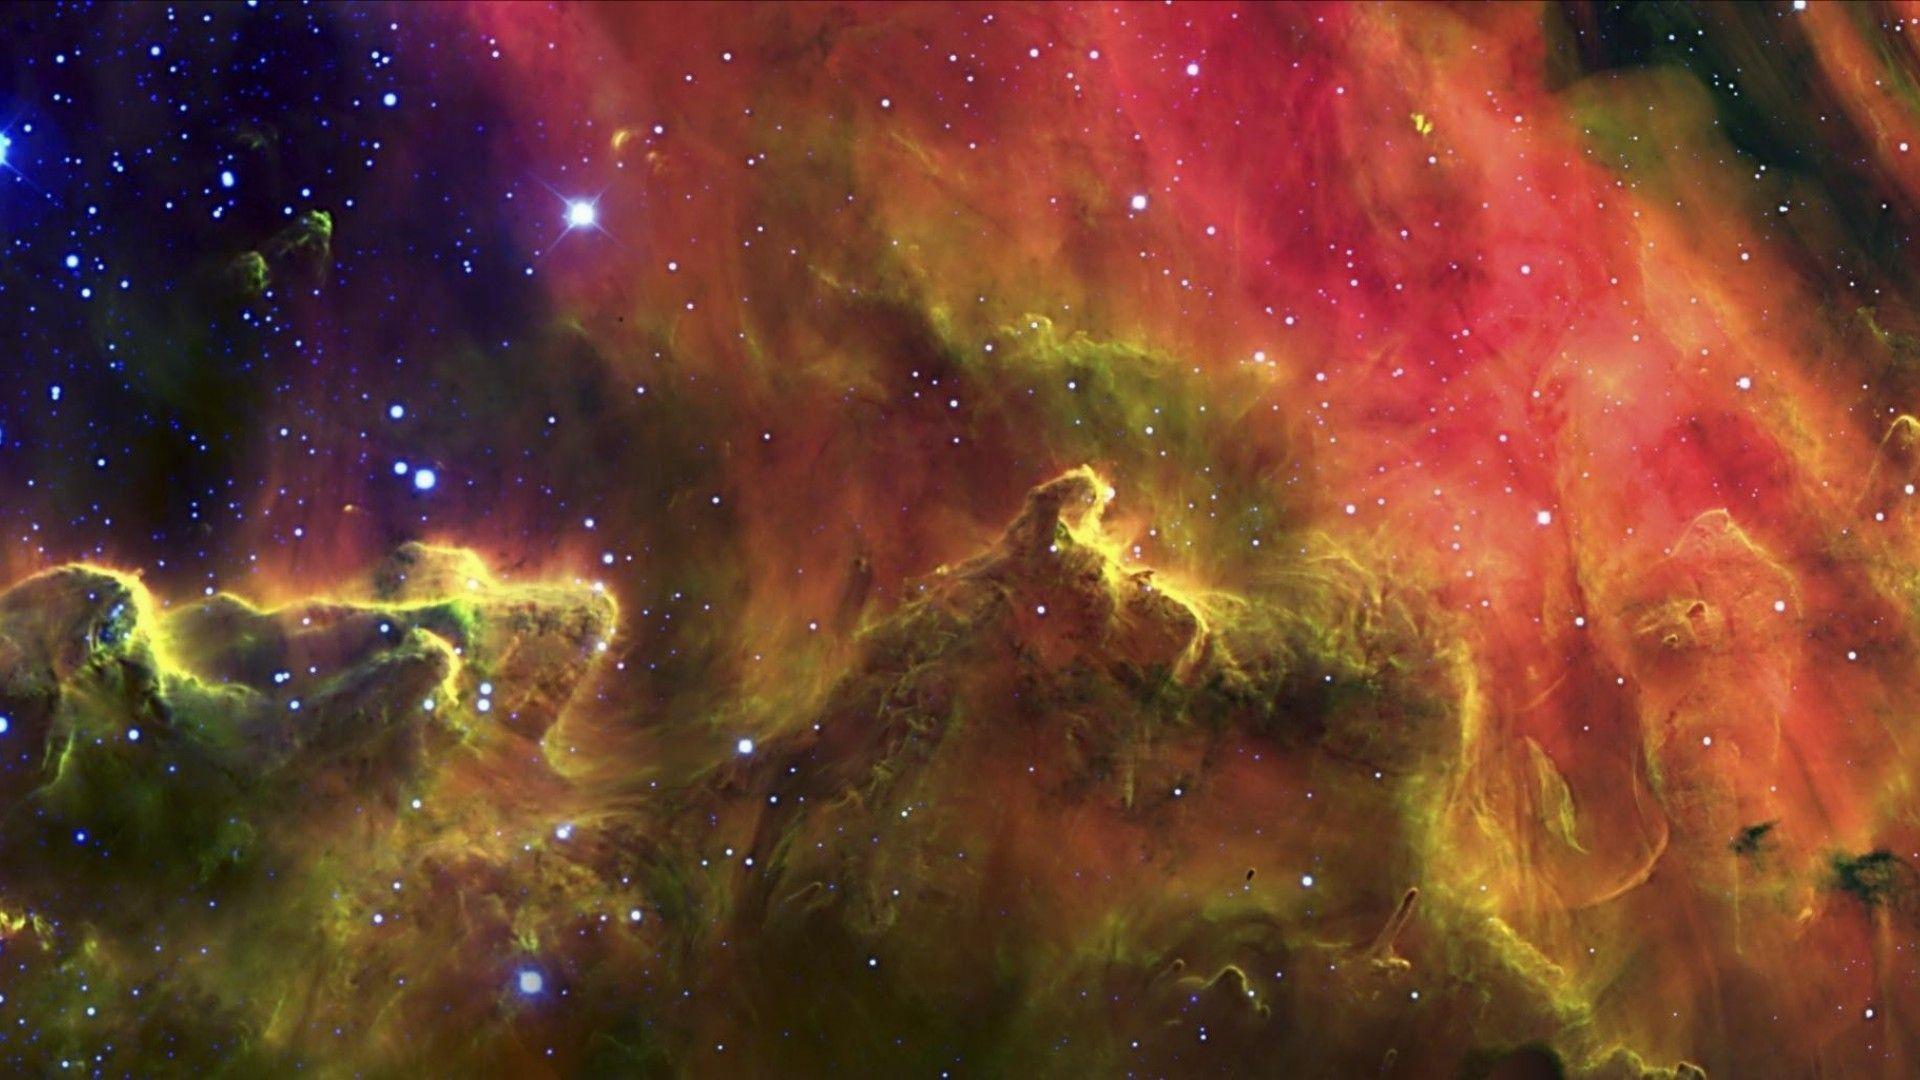 wallpaper.wiki-Hubble-Desktop-Backgrounds-1920×1080-PIC-WPD002233